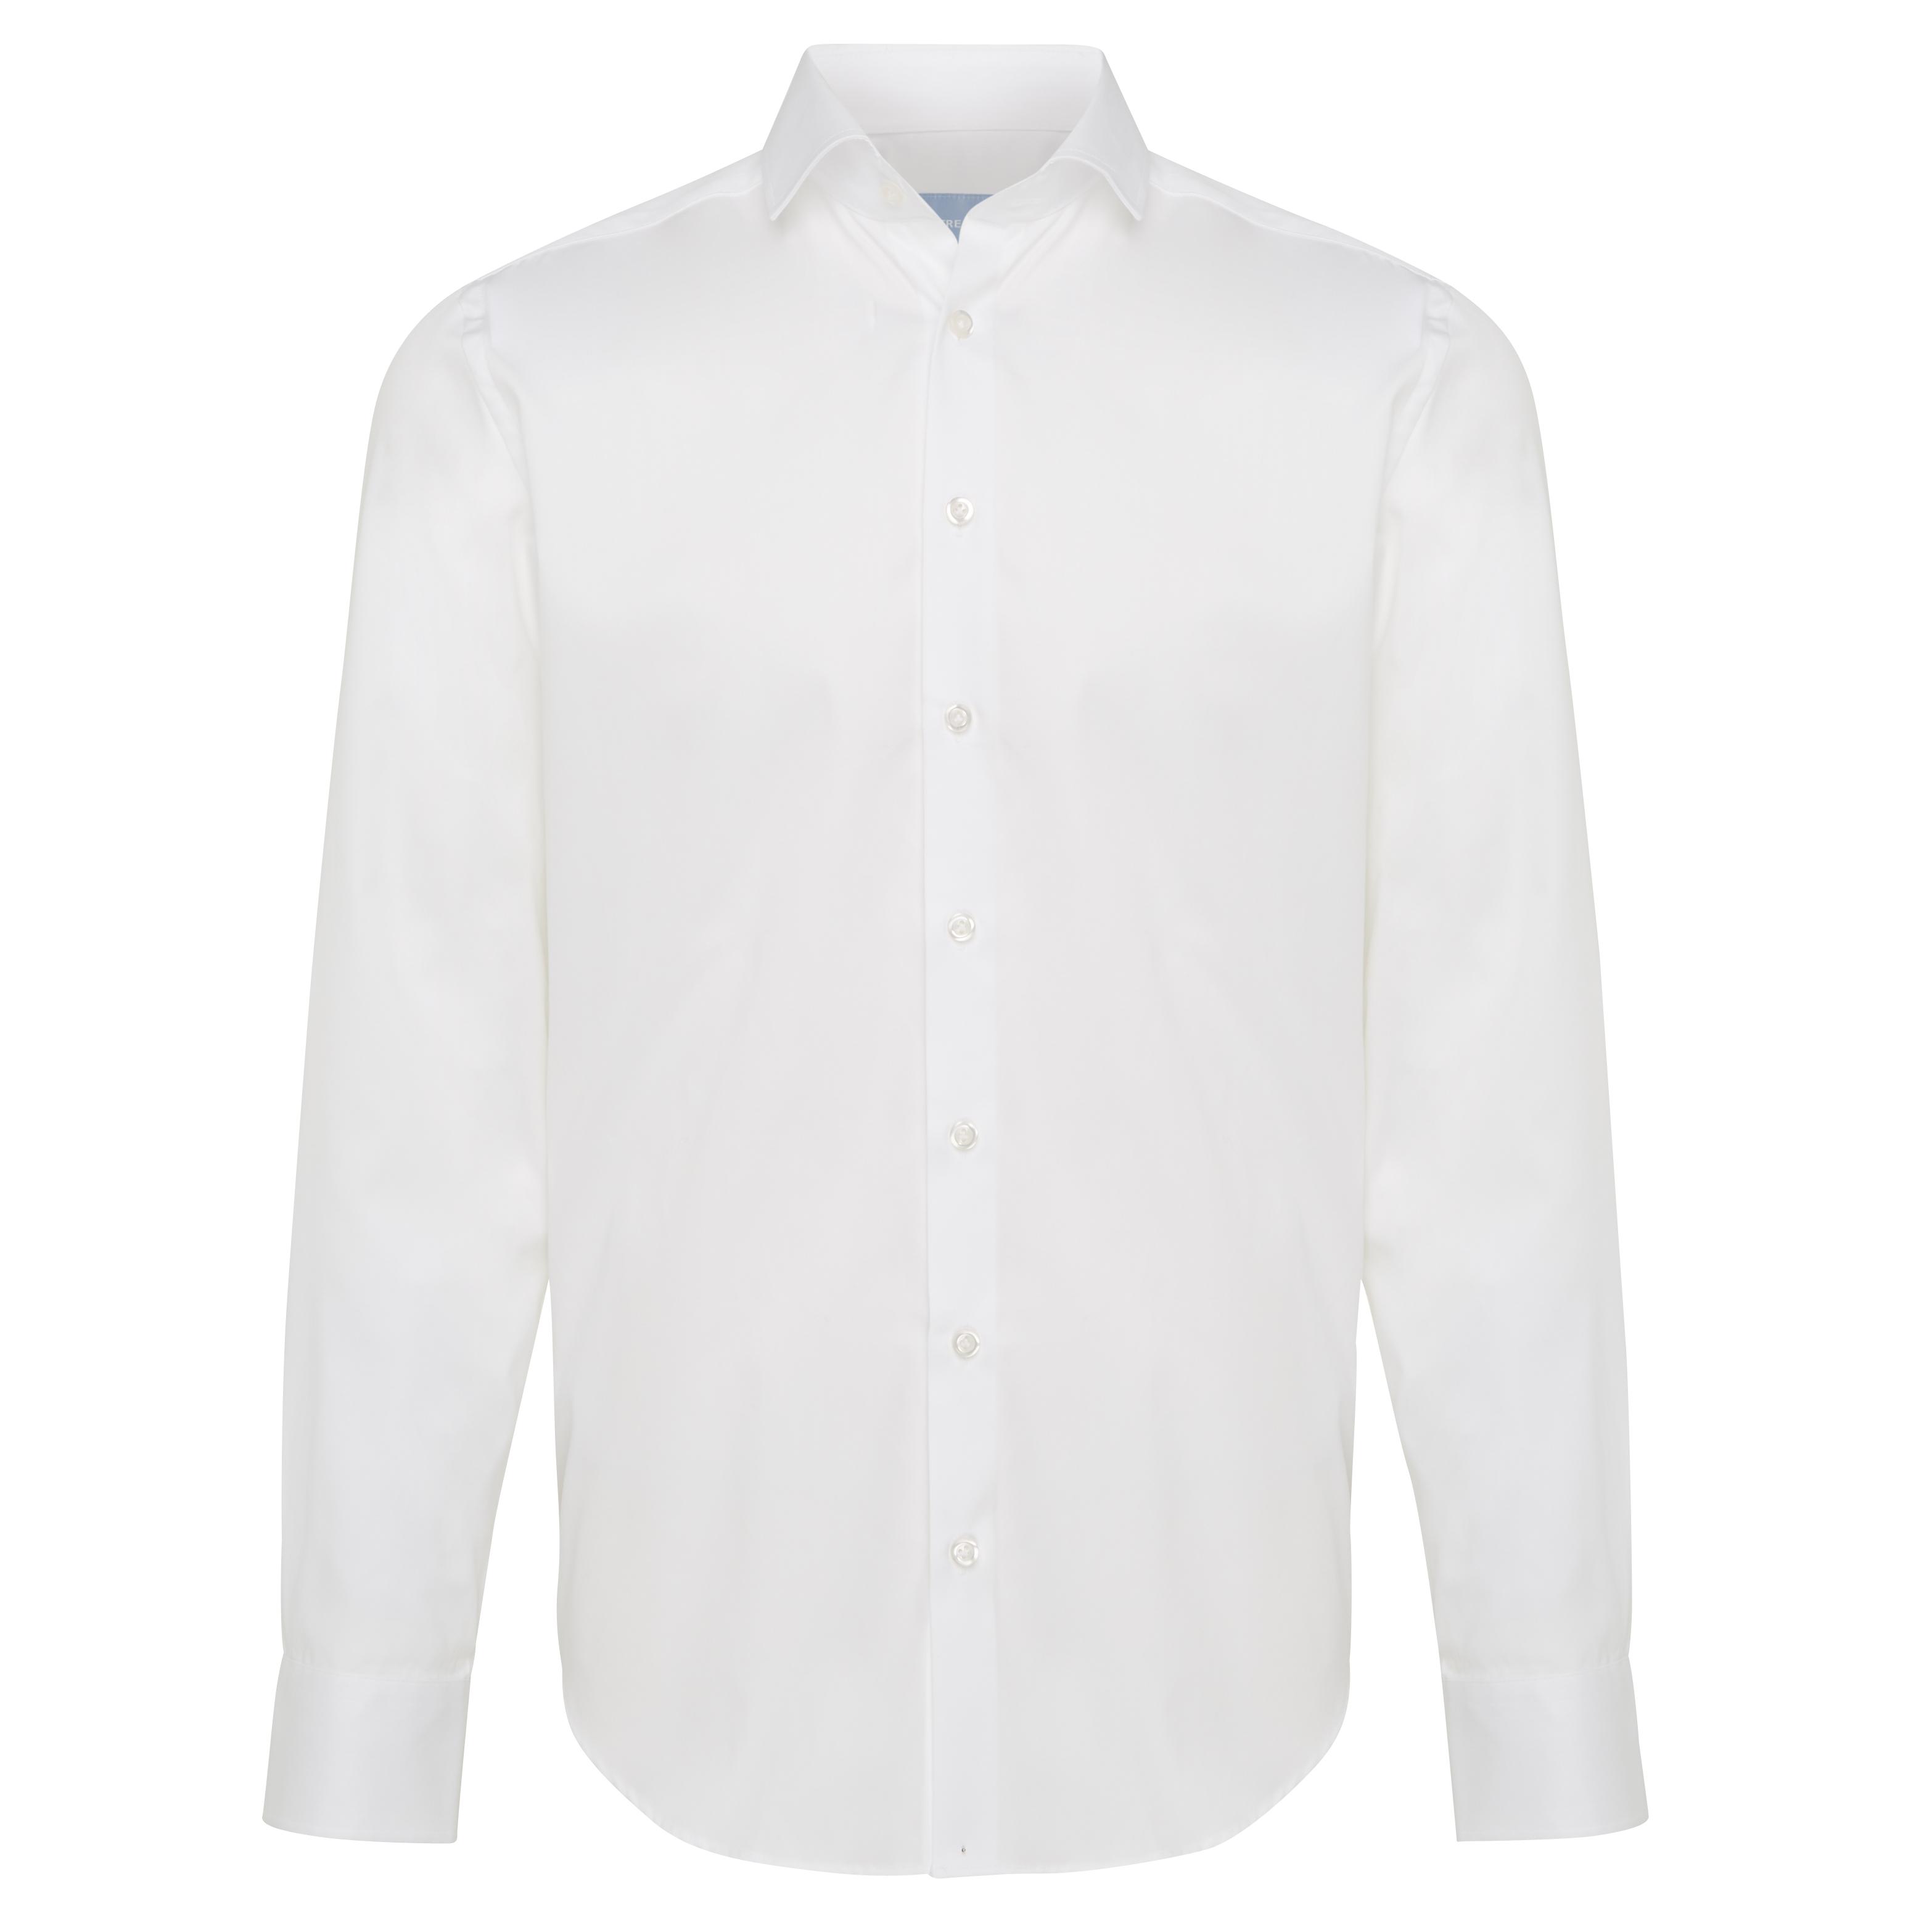 Non-iron shirt plain white - Regular Fit